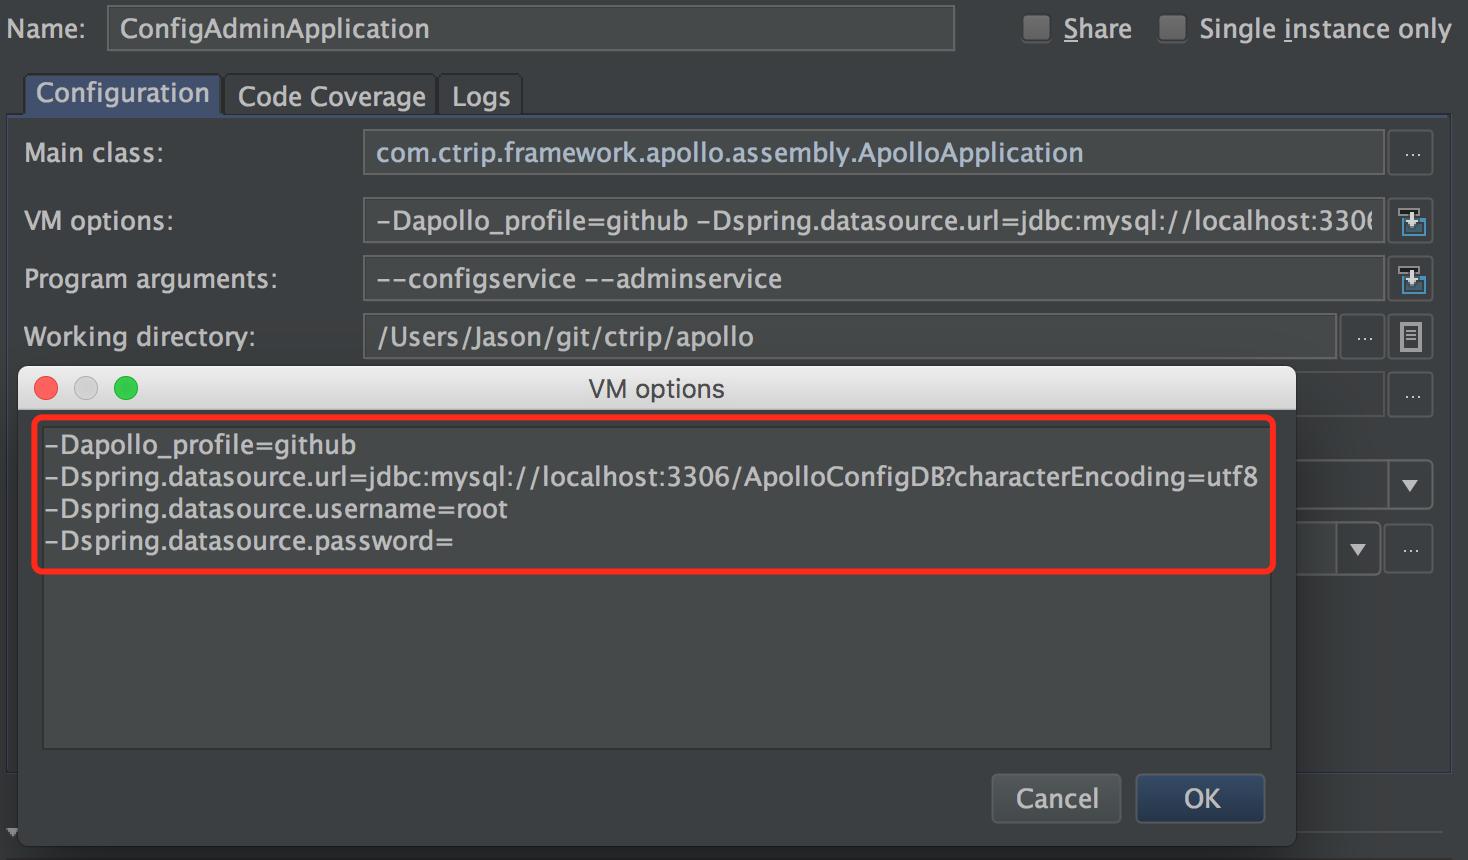 ConfigAdminApplication-VM-Options